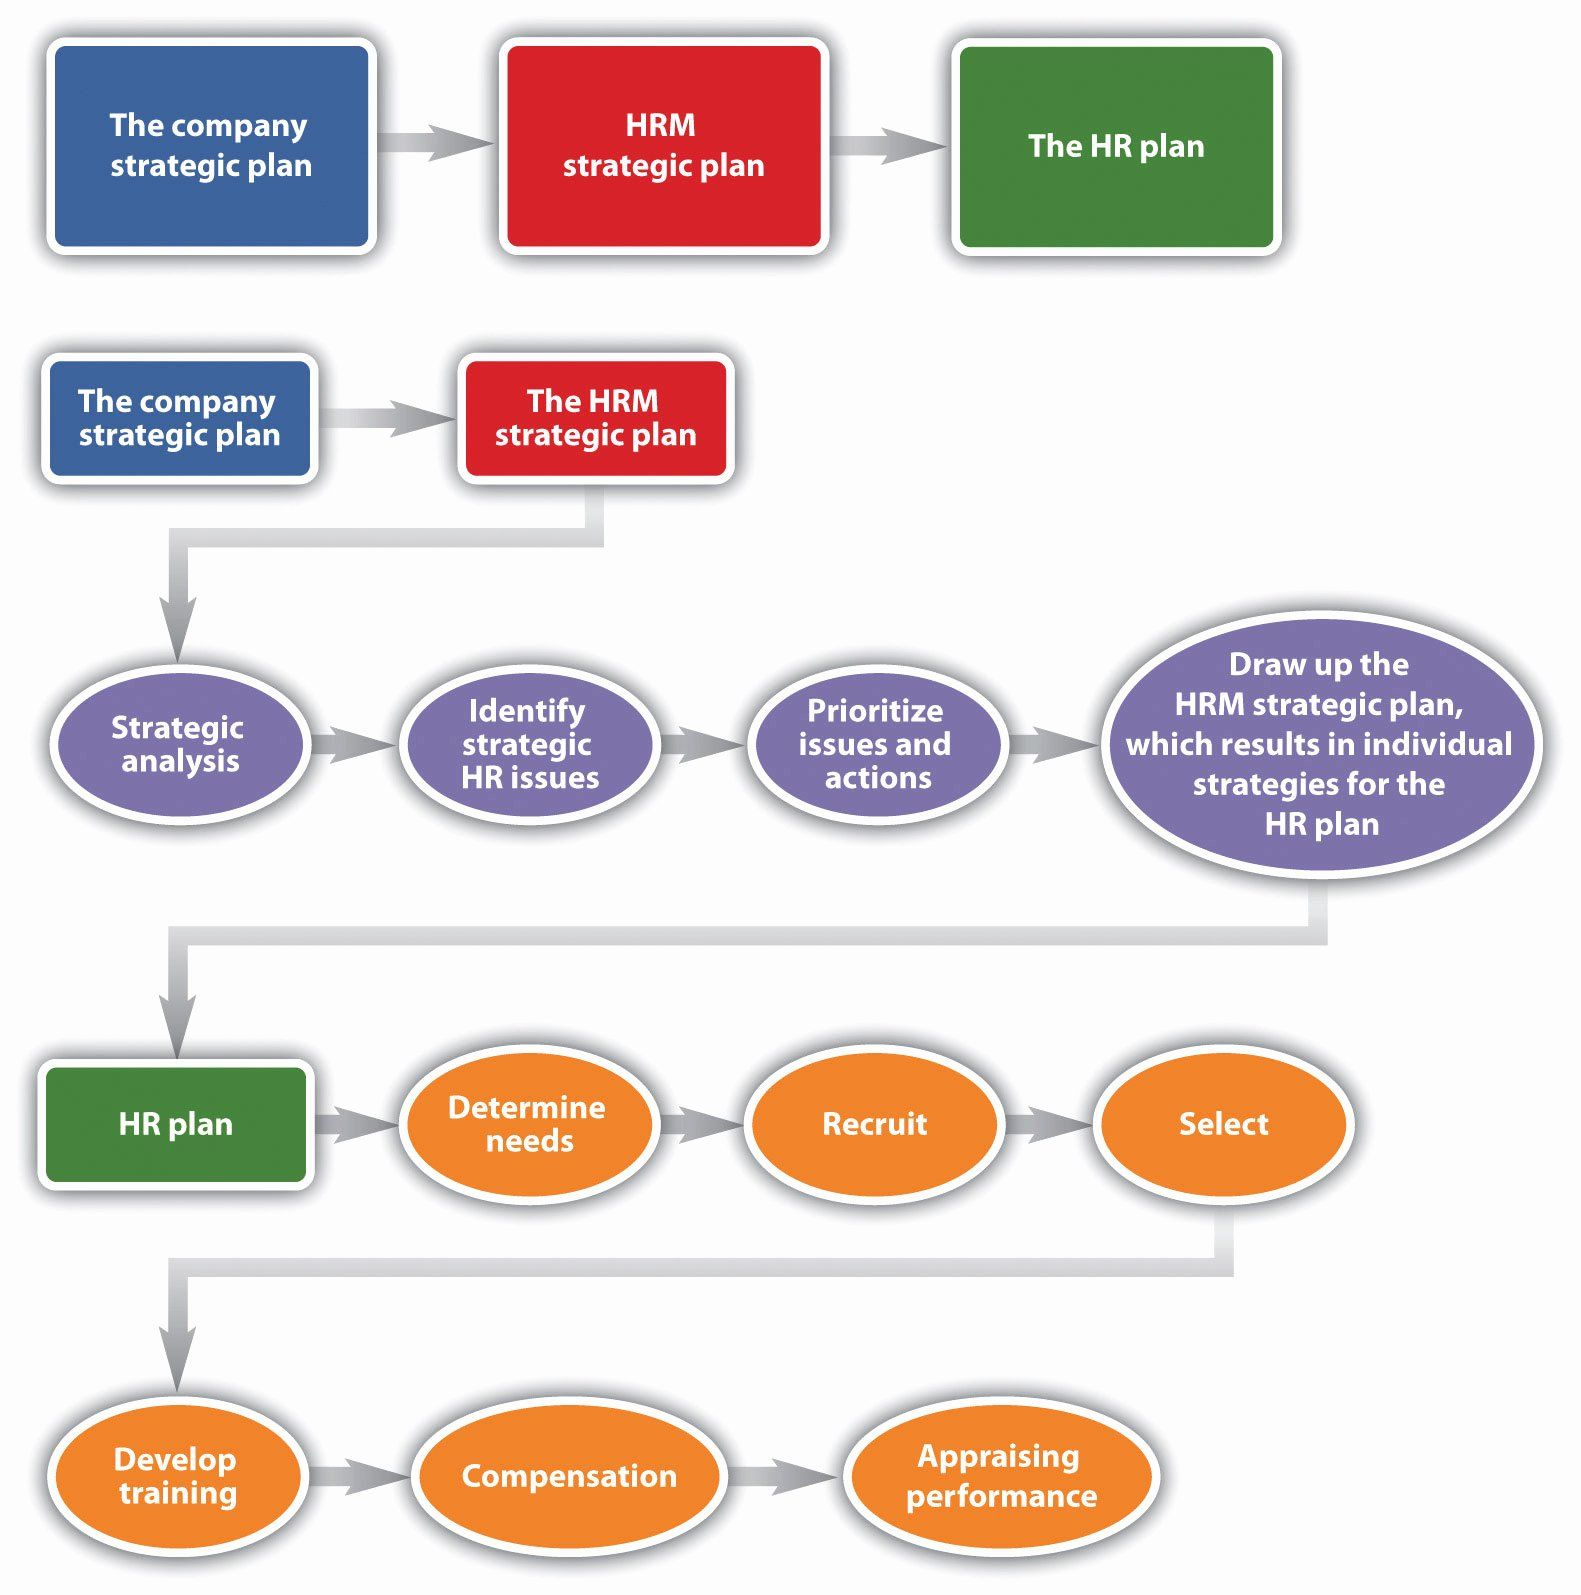 Strategic Plan Templates Free Examples Planning Nonprofit Template Best Business Strategic Planning Template Business Plan Template Sample Strategic Plan